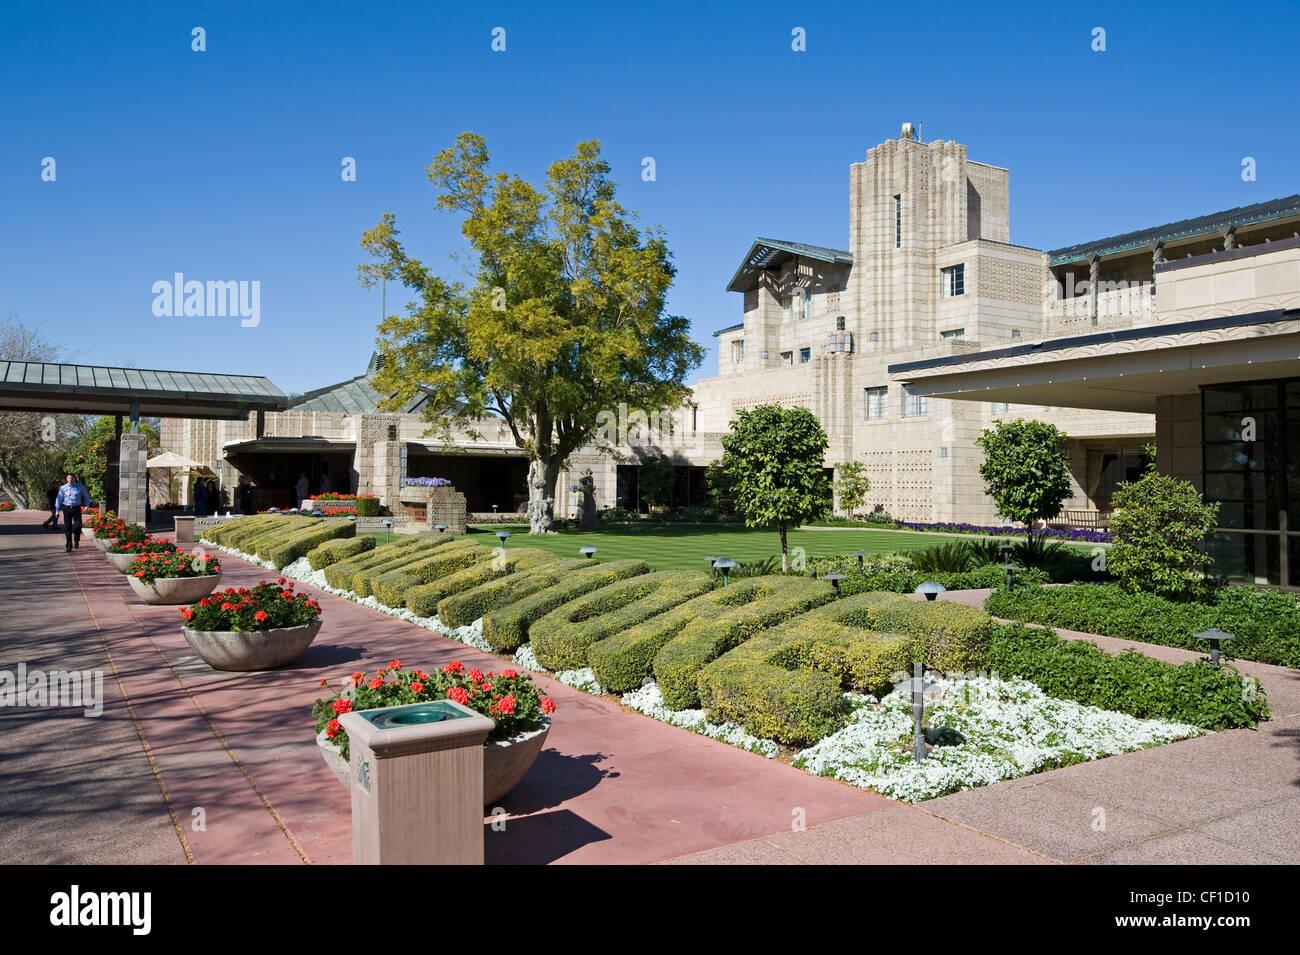 The Biltmore Resort & Hotel, Phoenix, Arizona, USA - Stock Image